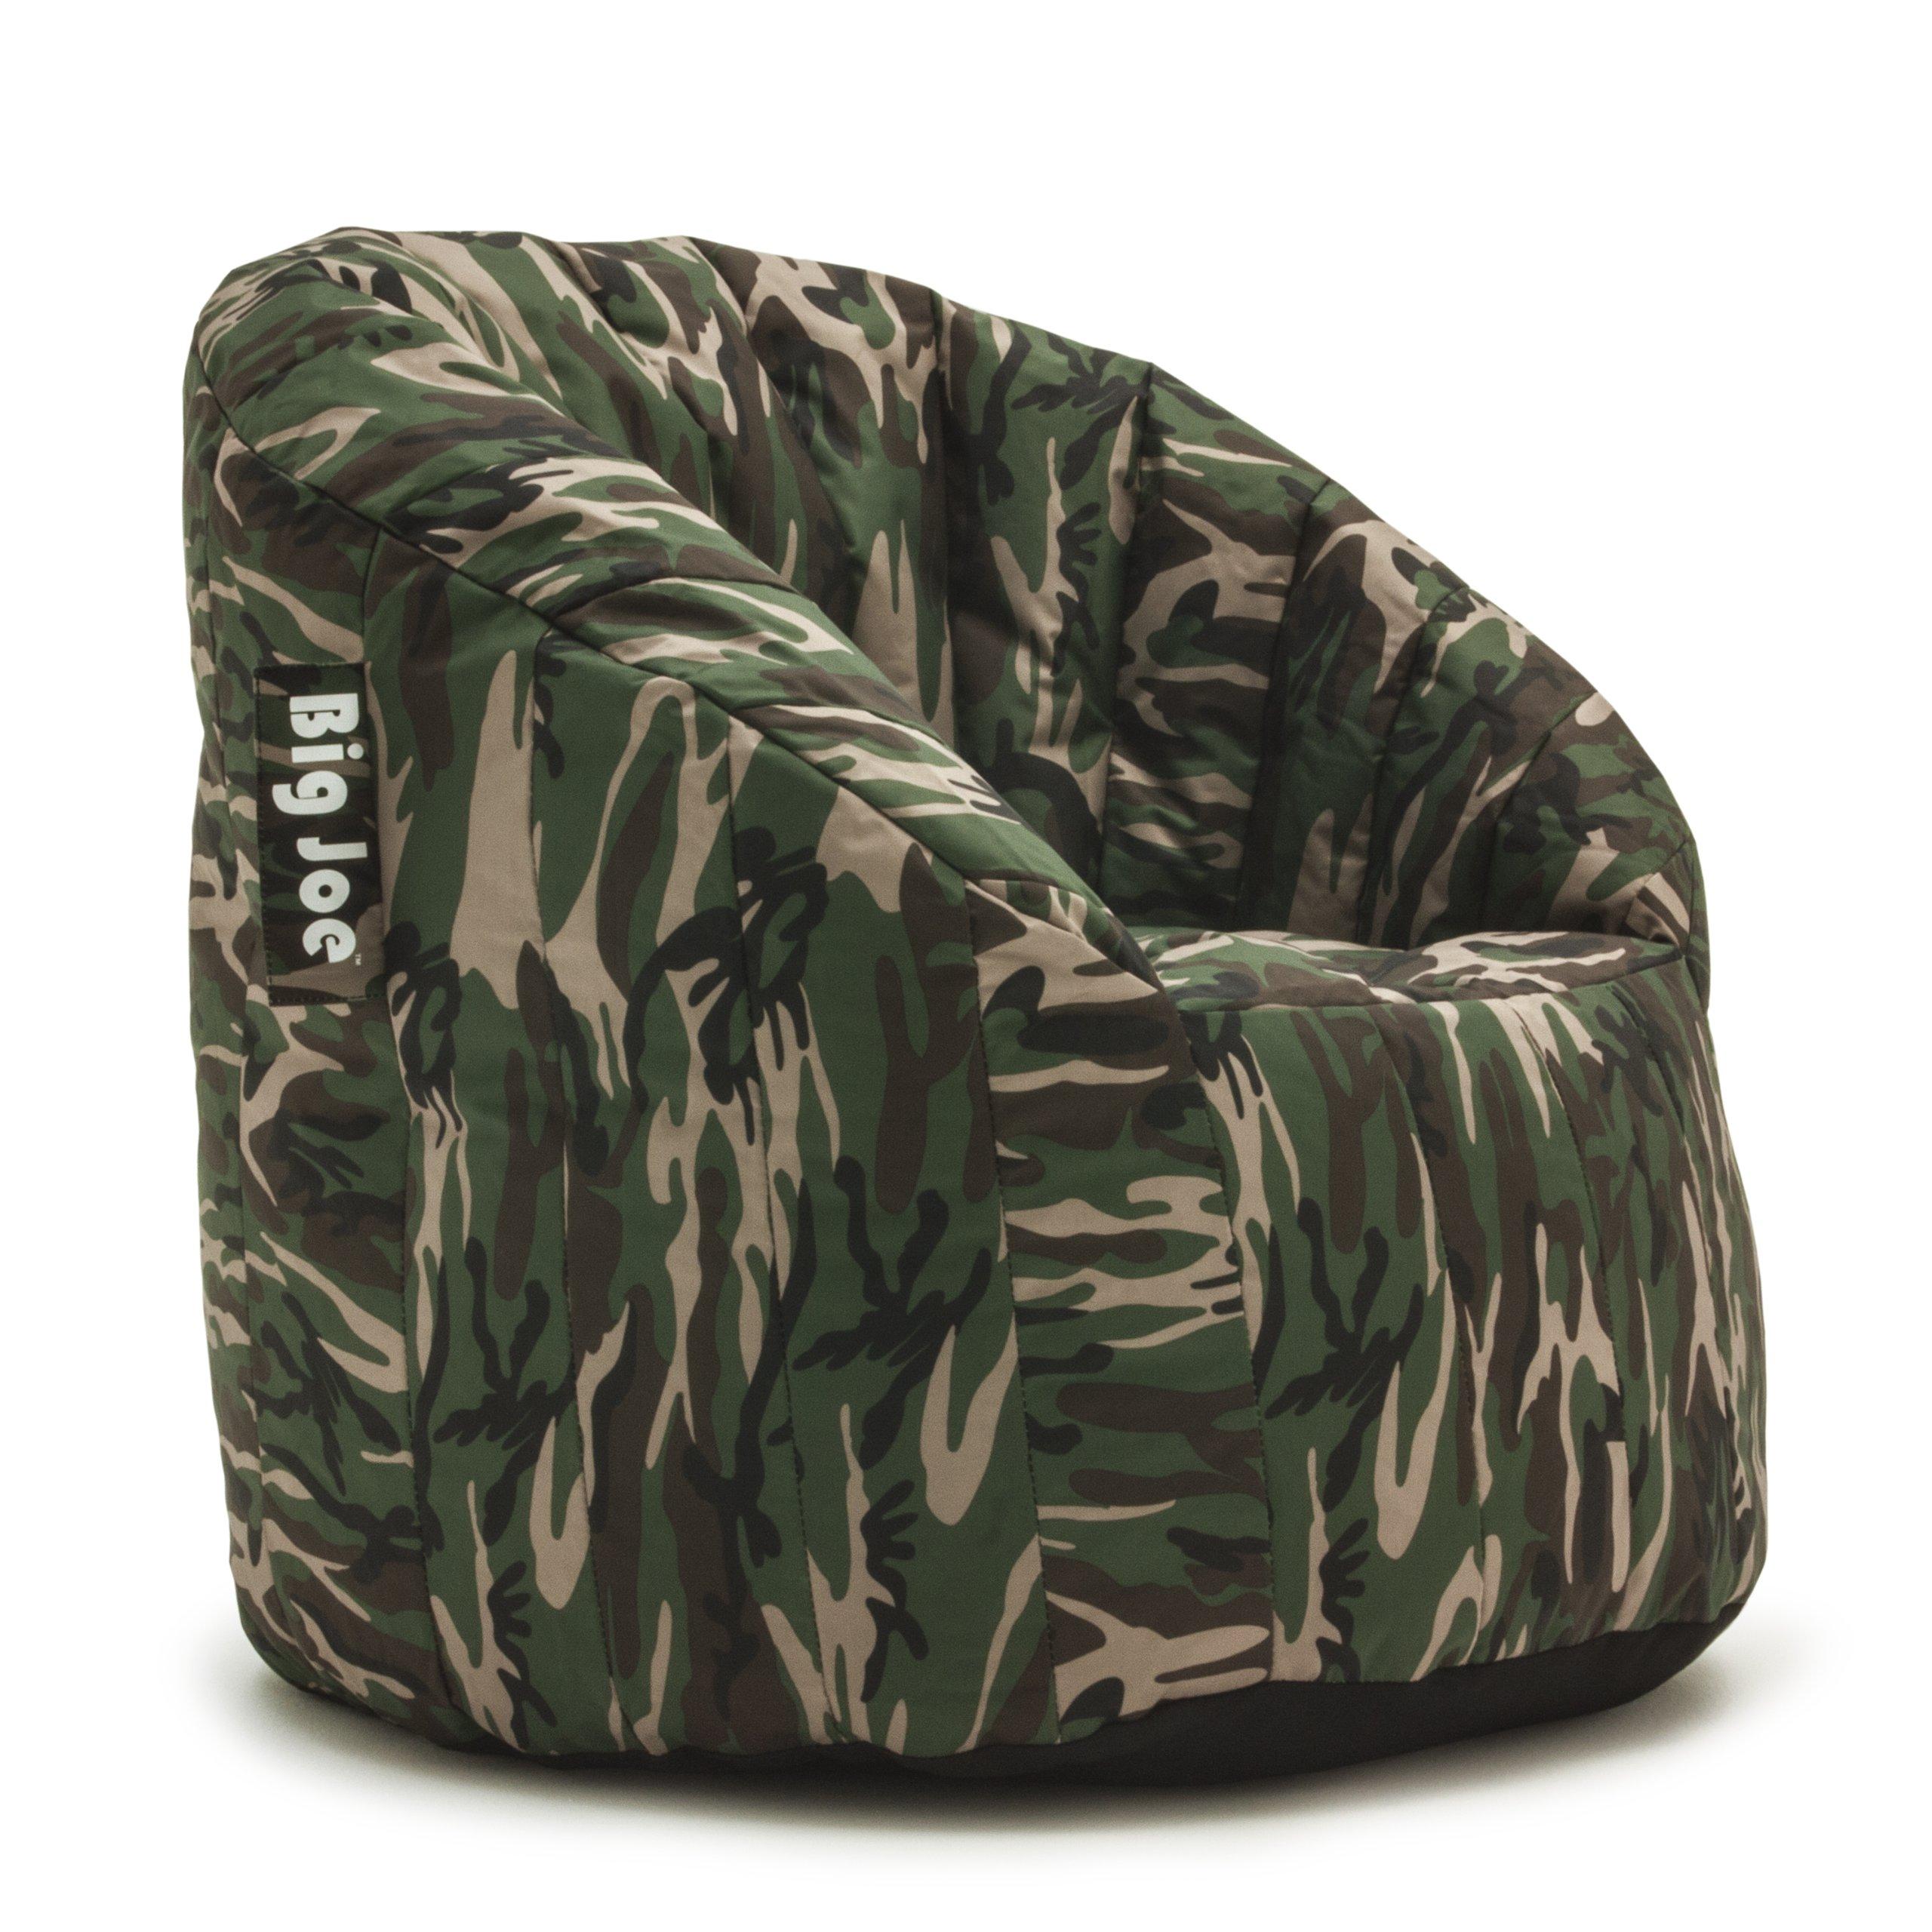 Big Joe Lumin SmartMax Fabric Chair, Woodland Camo by Big Joe